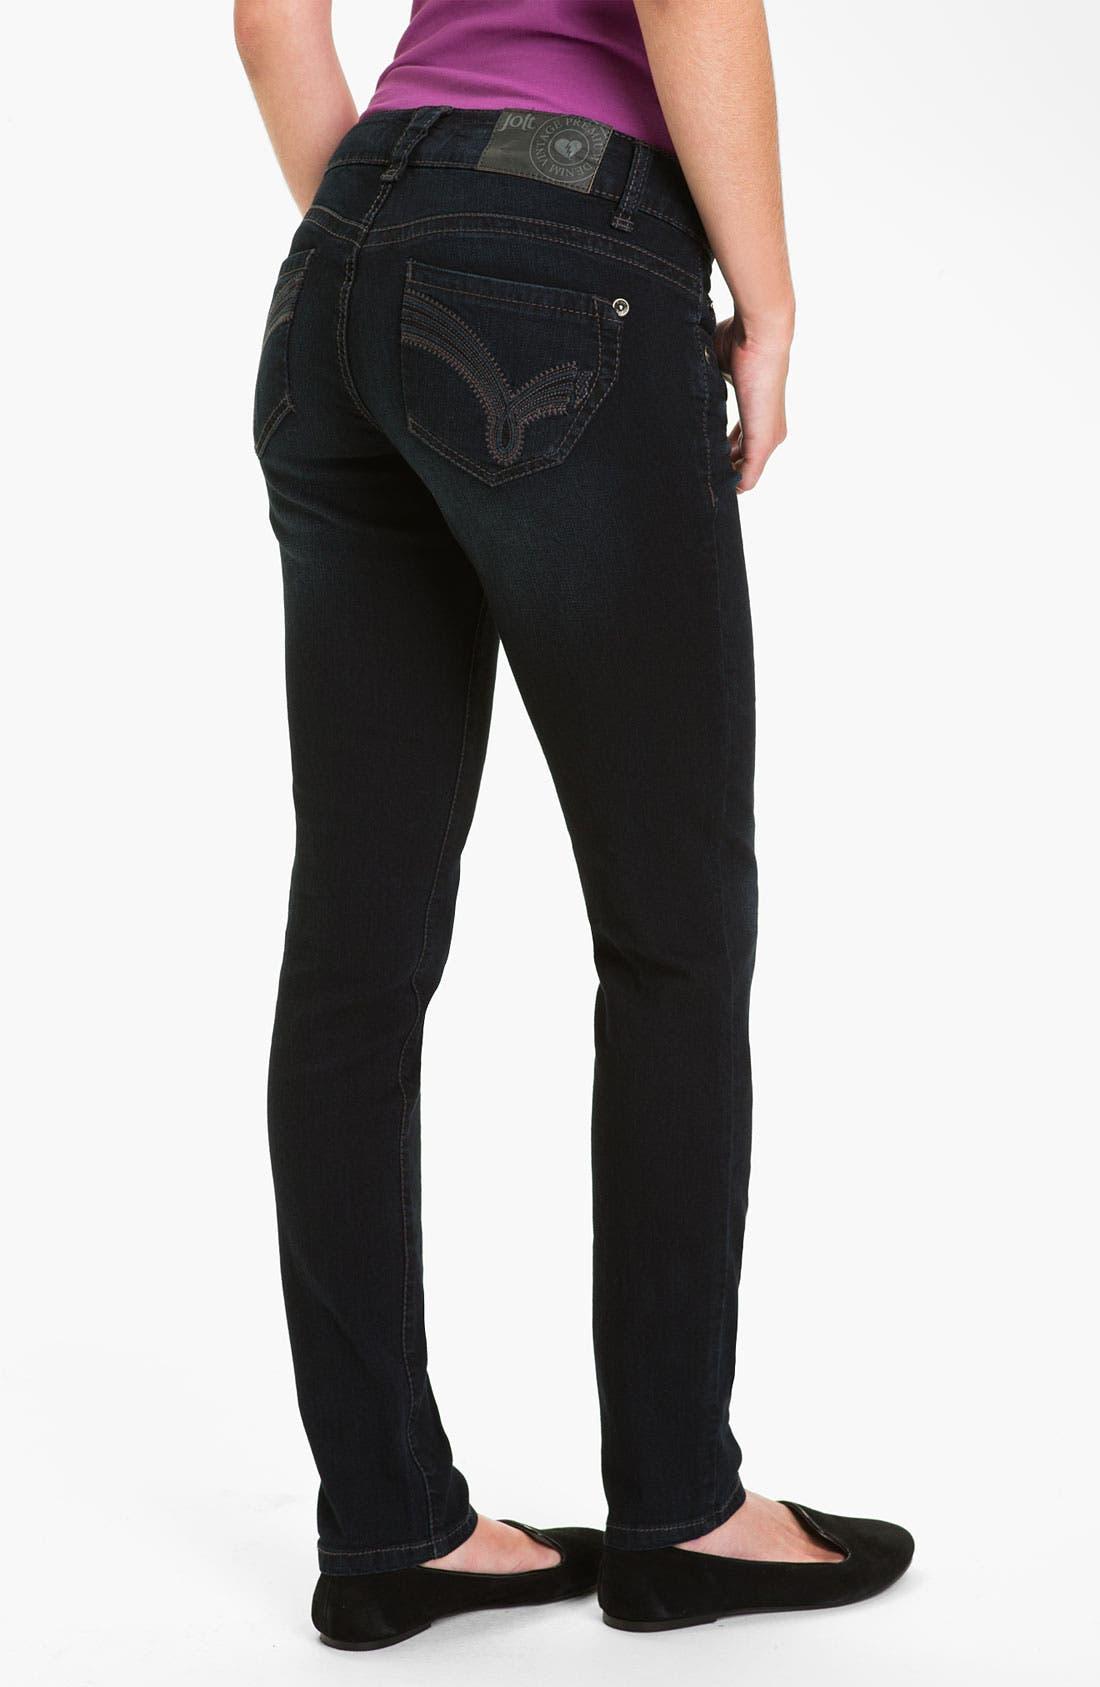 Main Image - Jolt 'J Pocket' Skinny Jeans (Juniors)